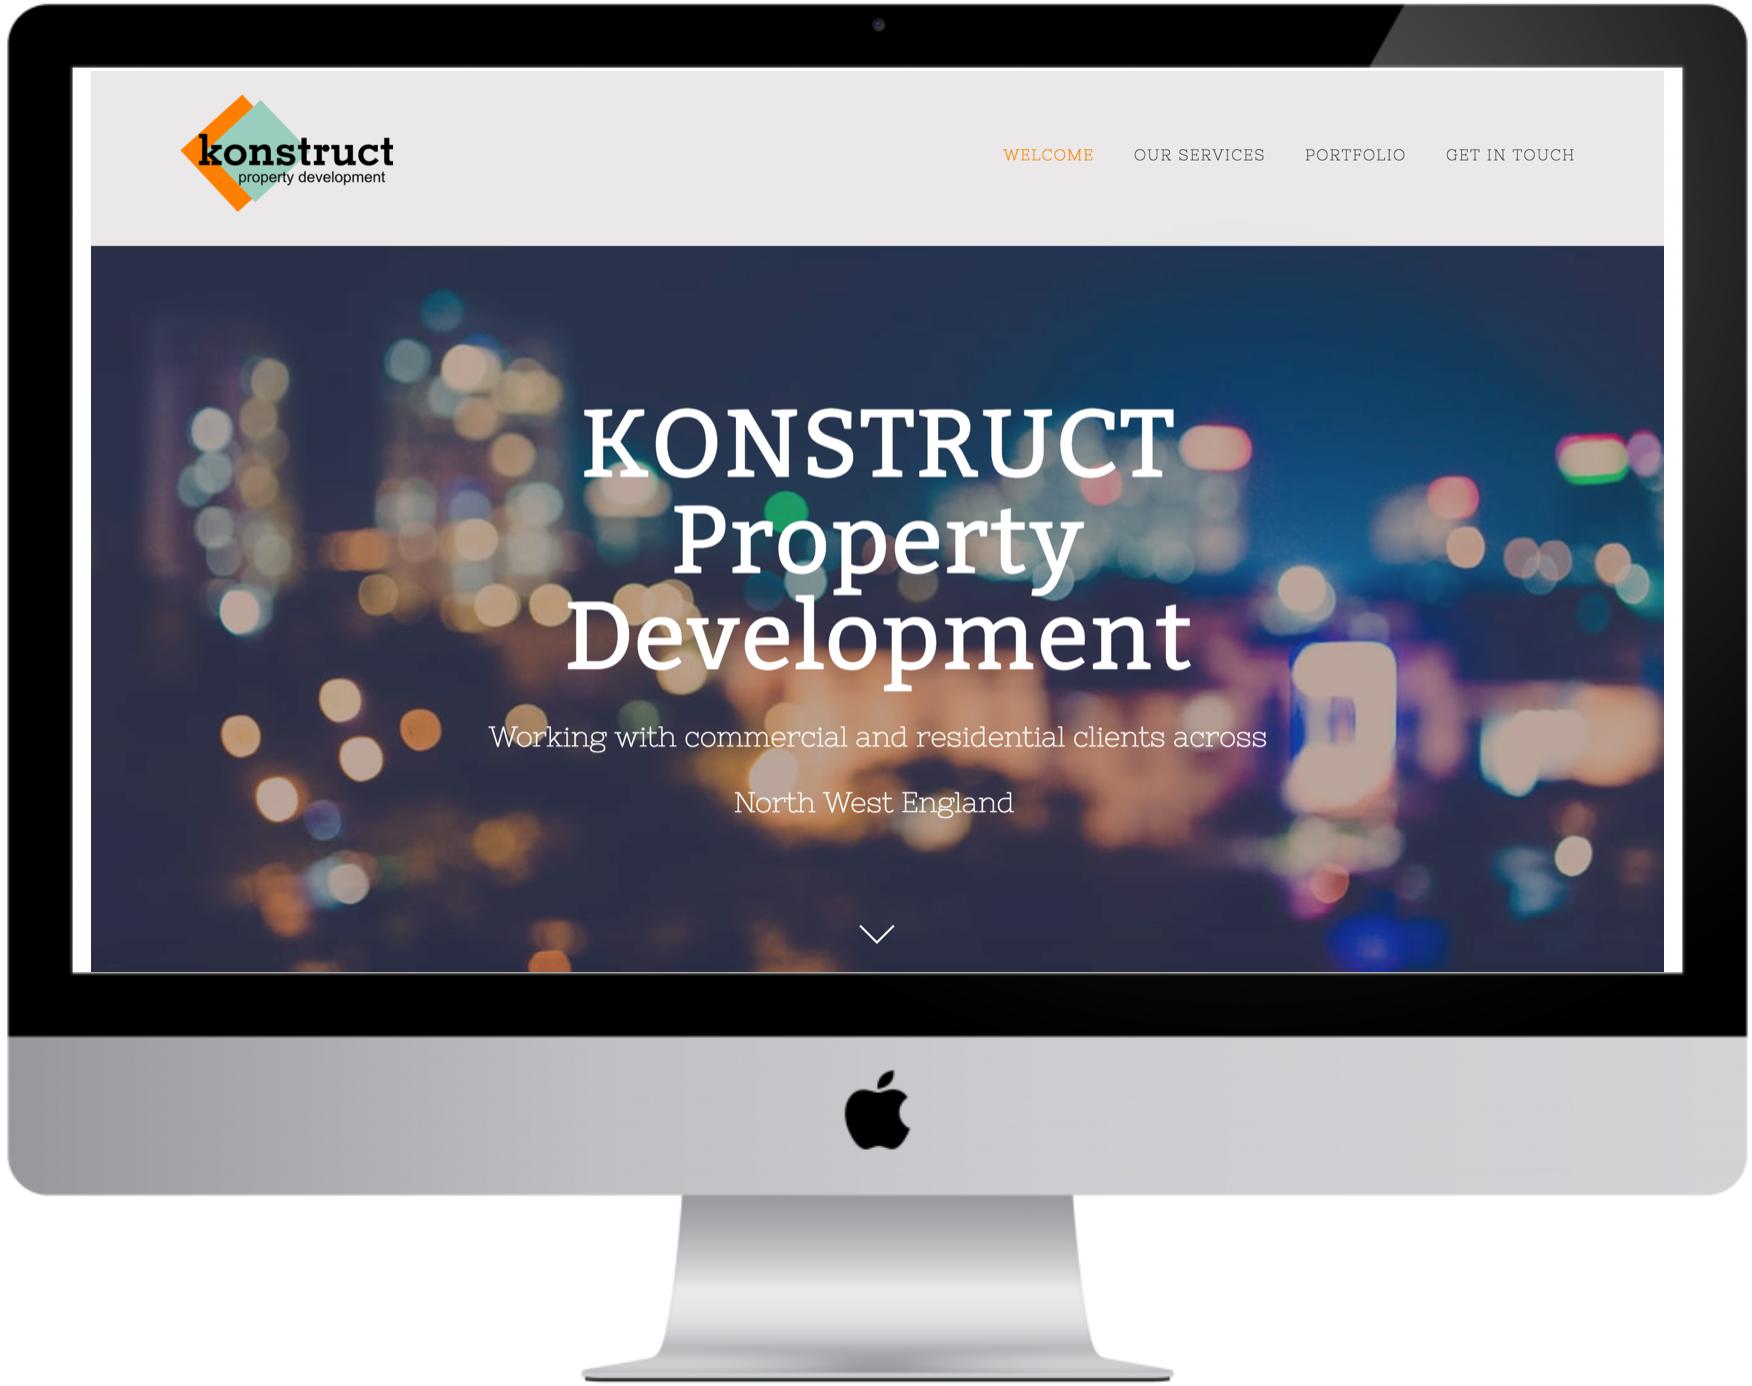 konstruct.png